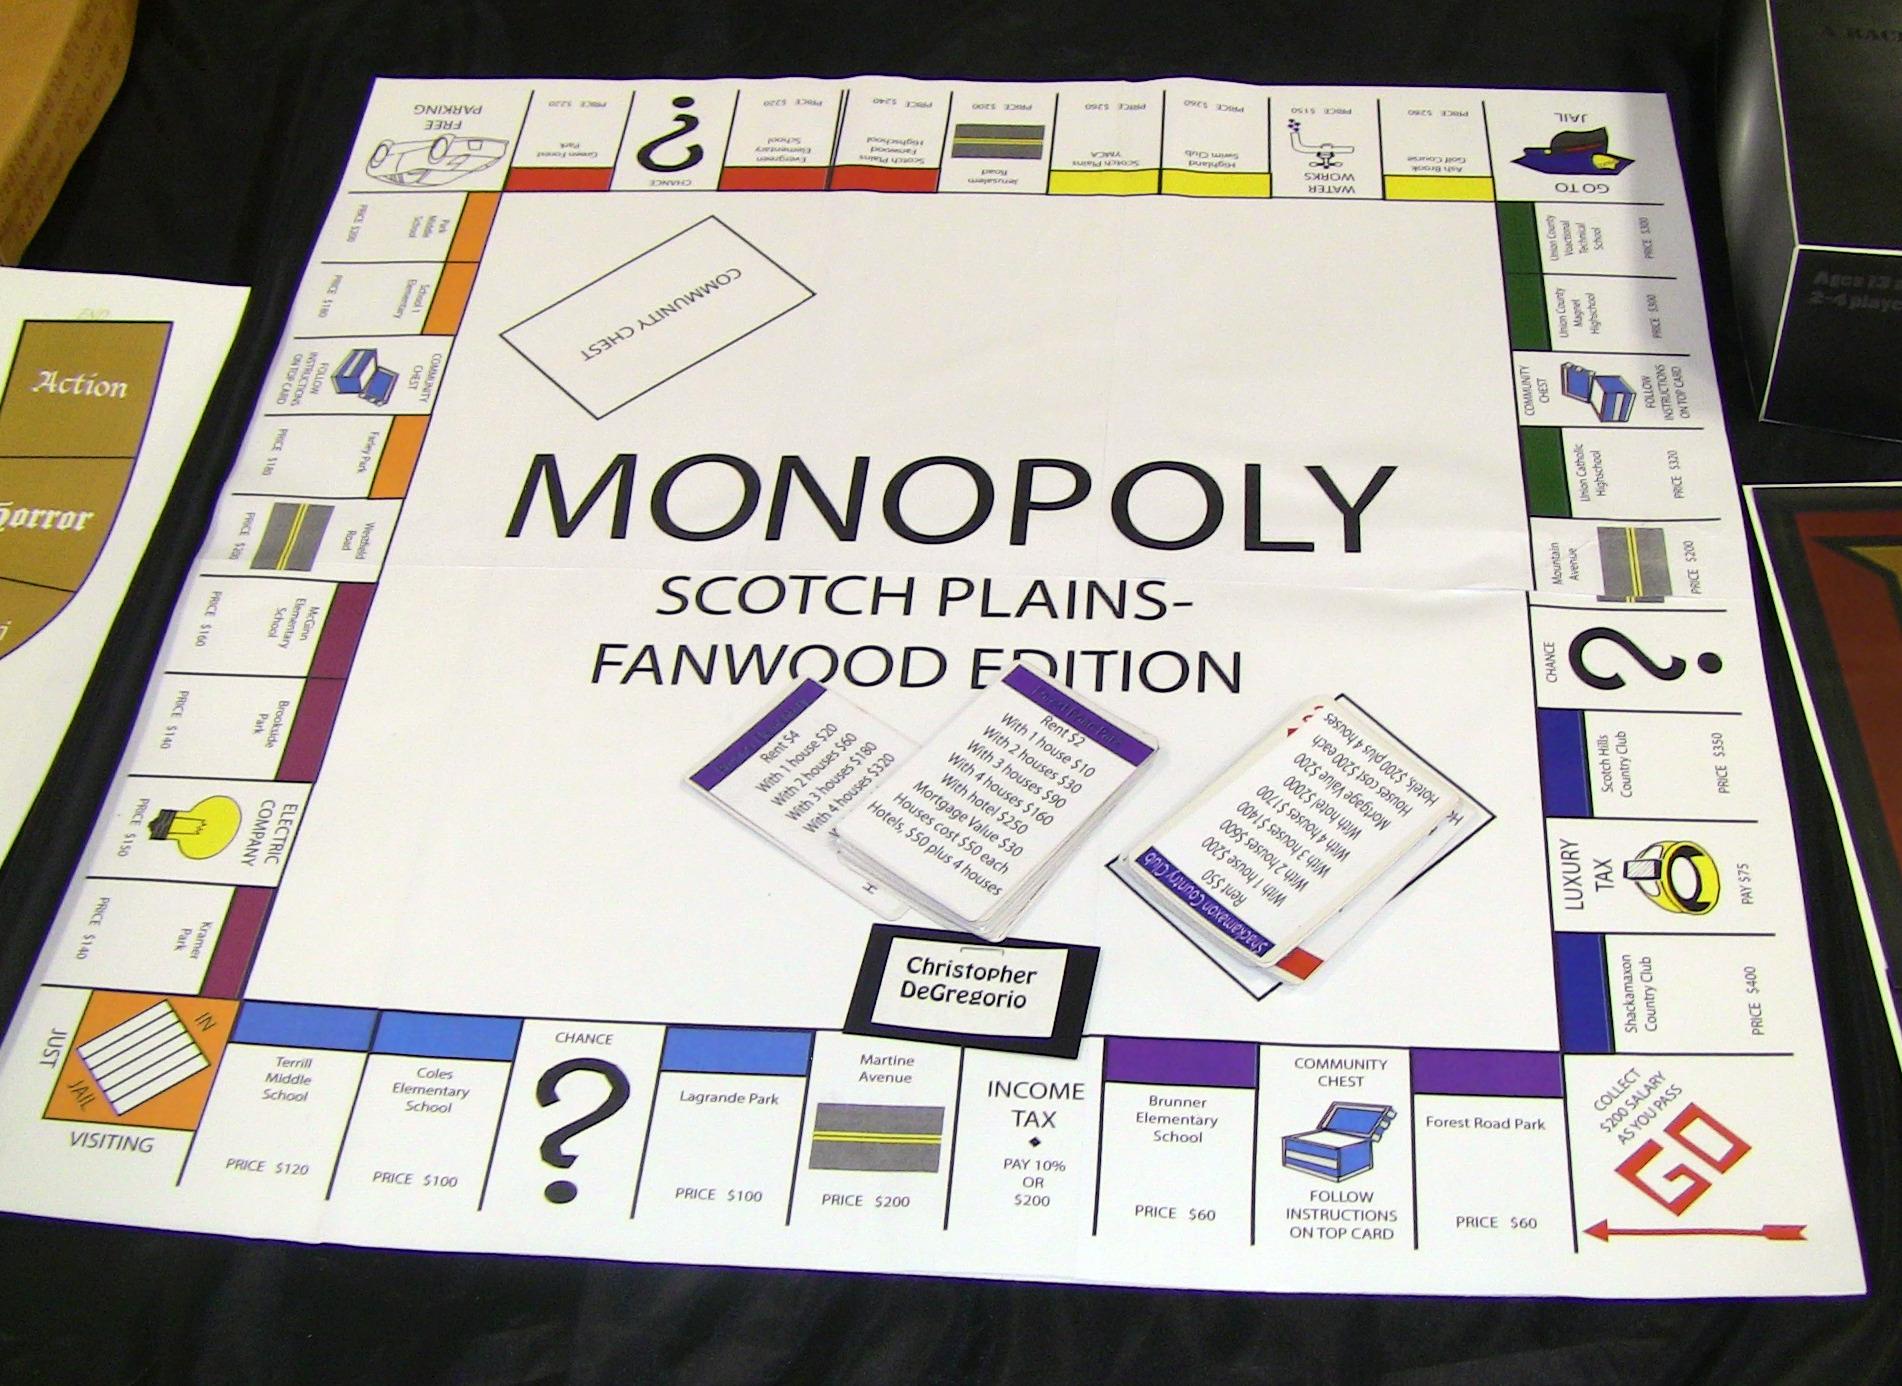 924b94d89d60a7ce2da4_SPF_Monopoly_Game.jpg